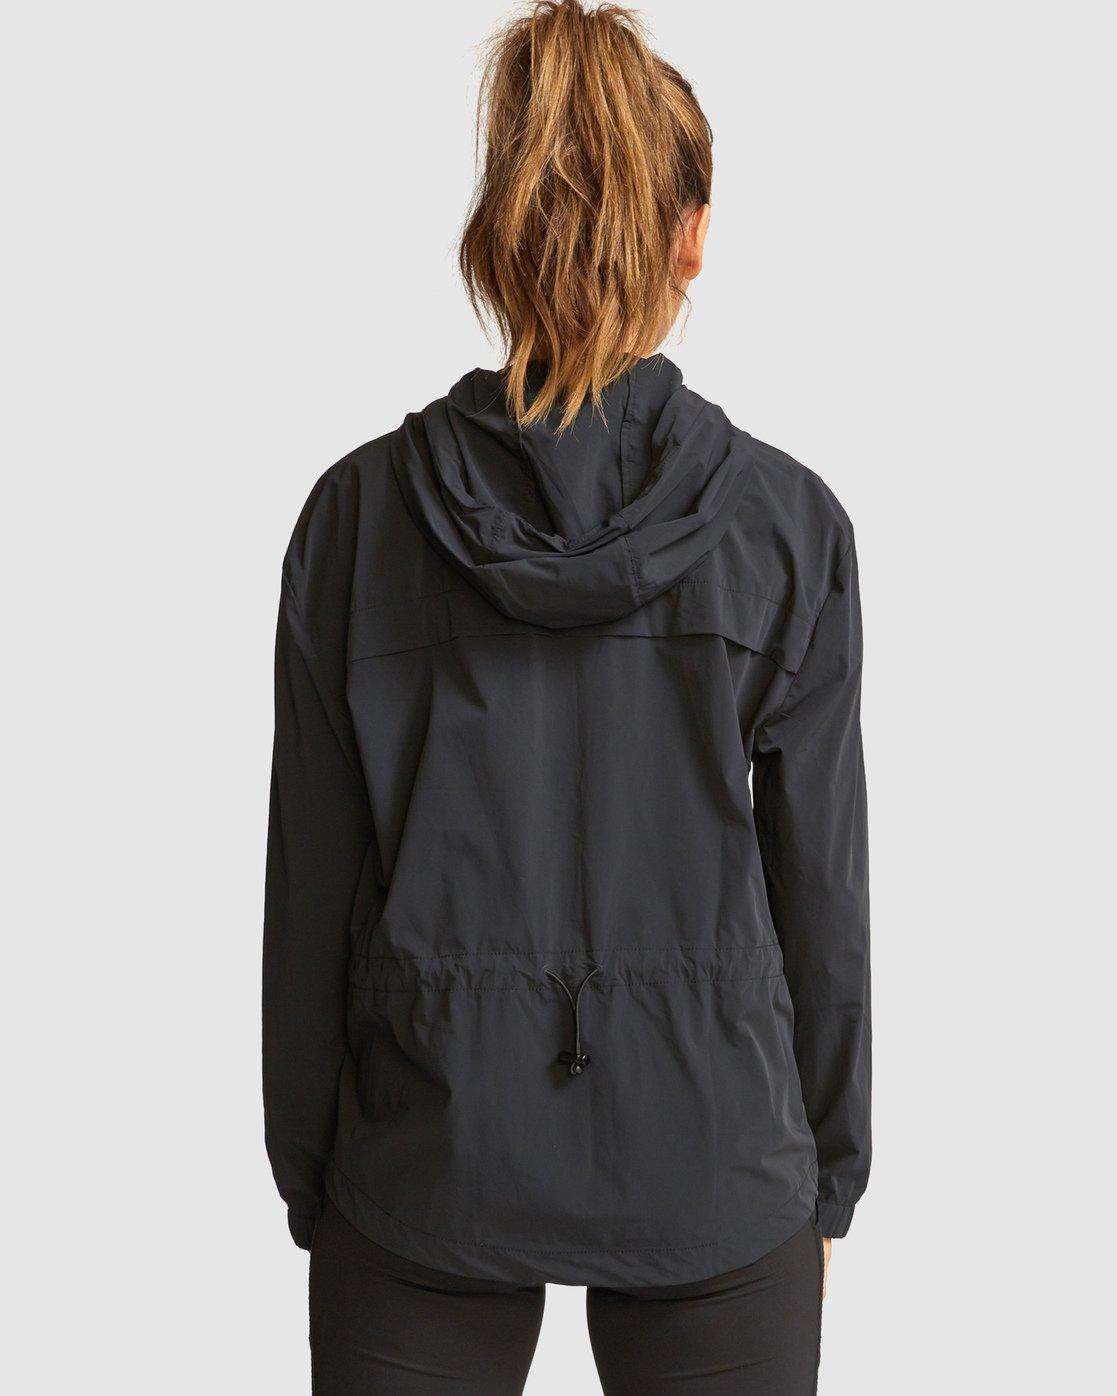 4 Flux Tech Jacket Black R491879 RVCA